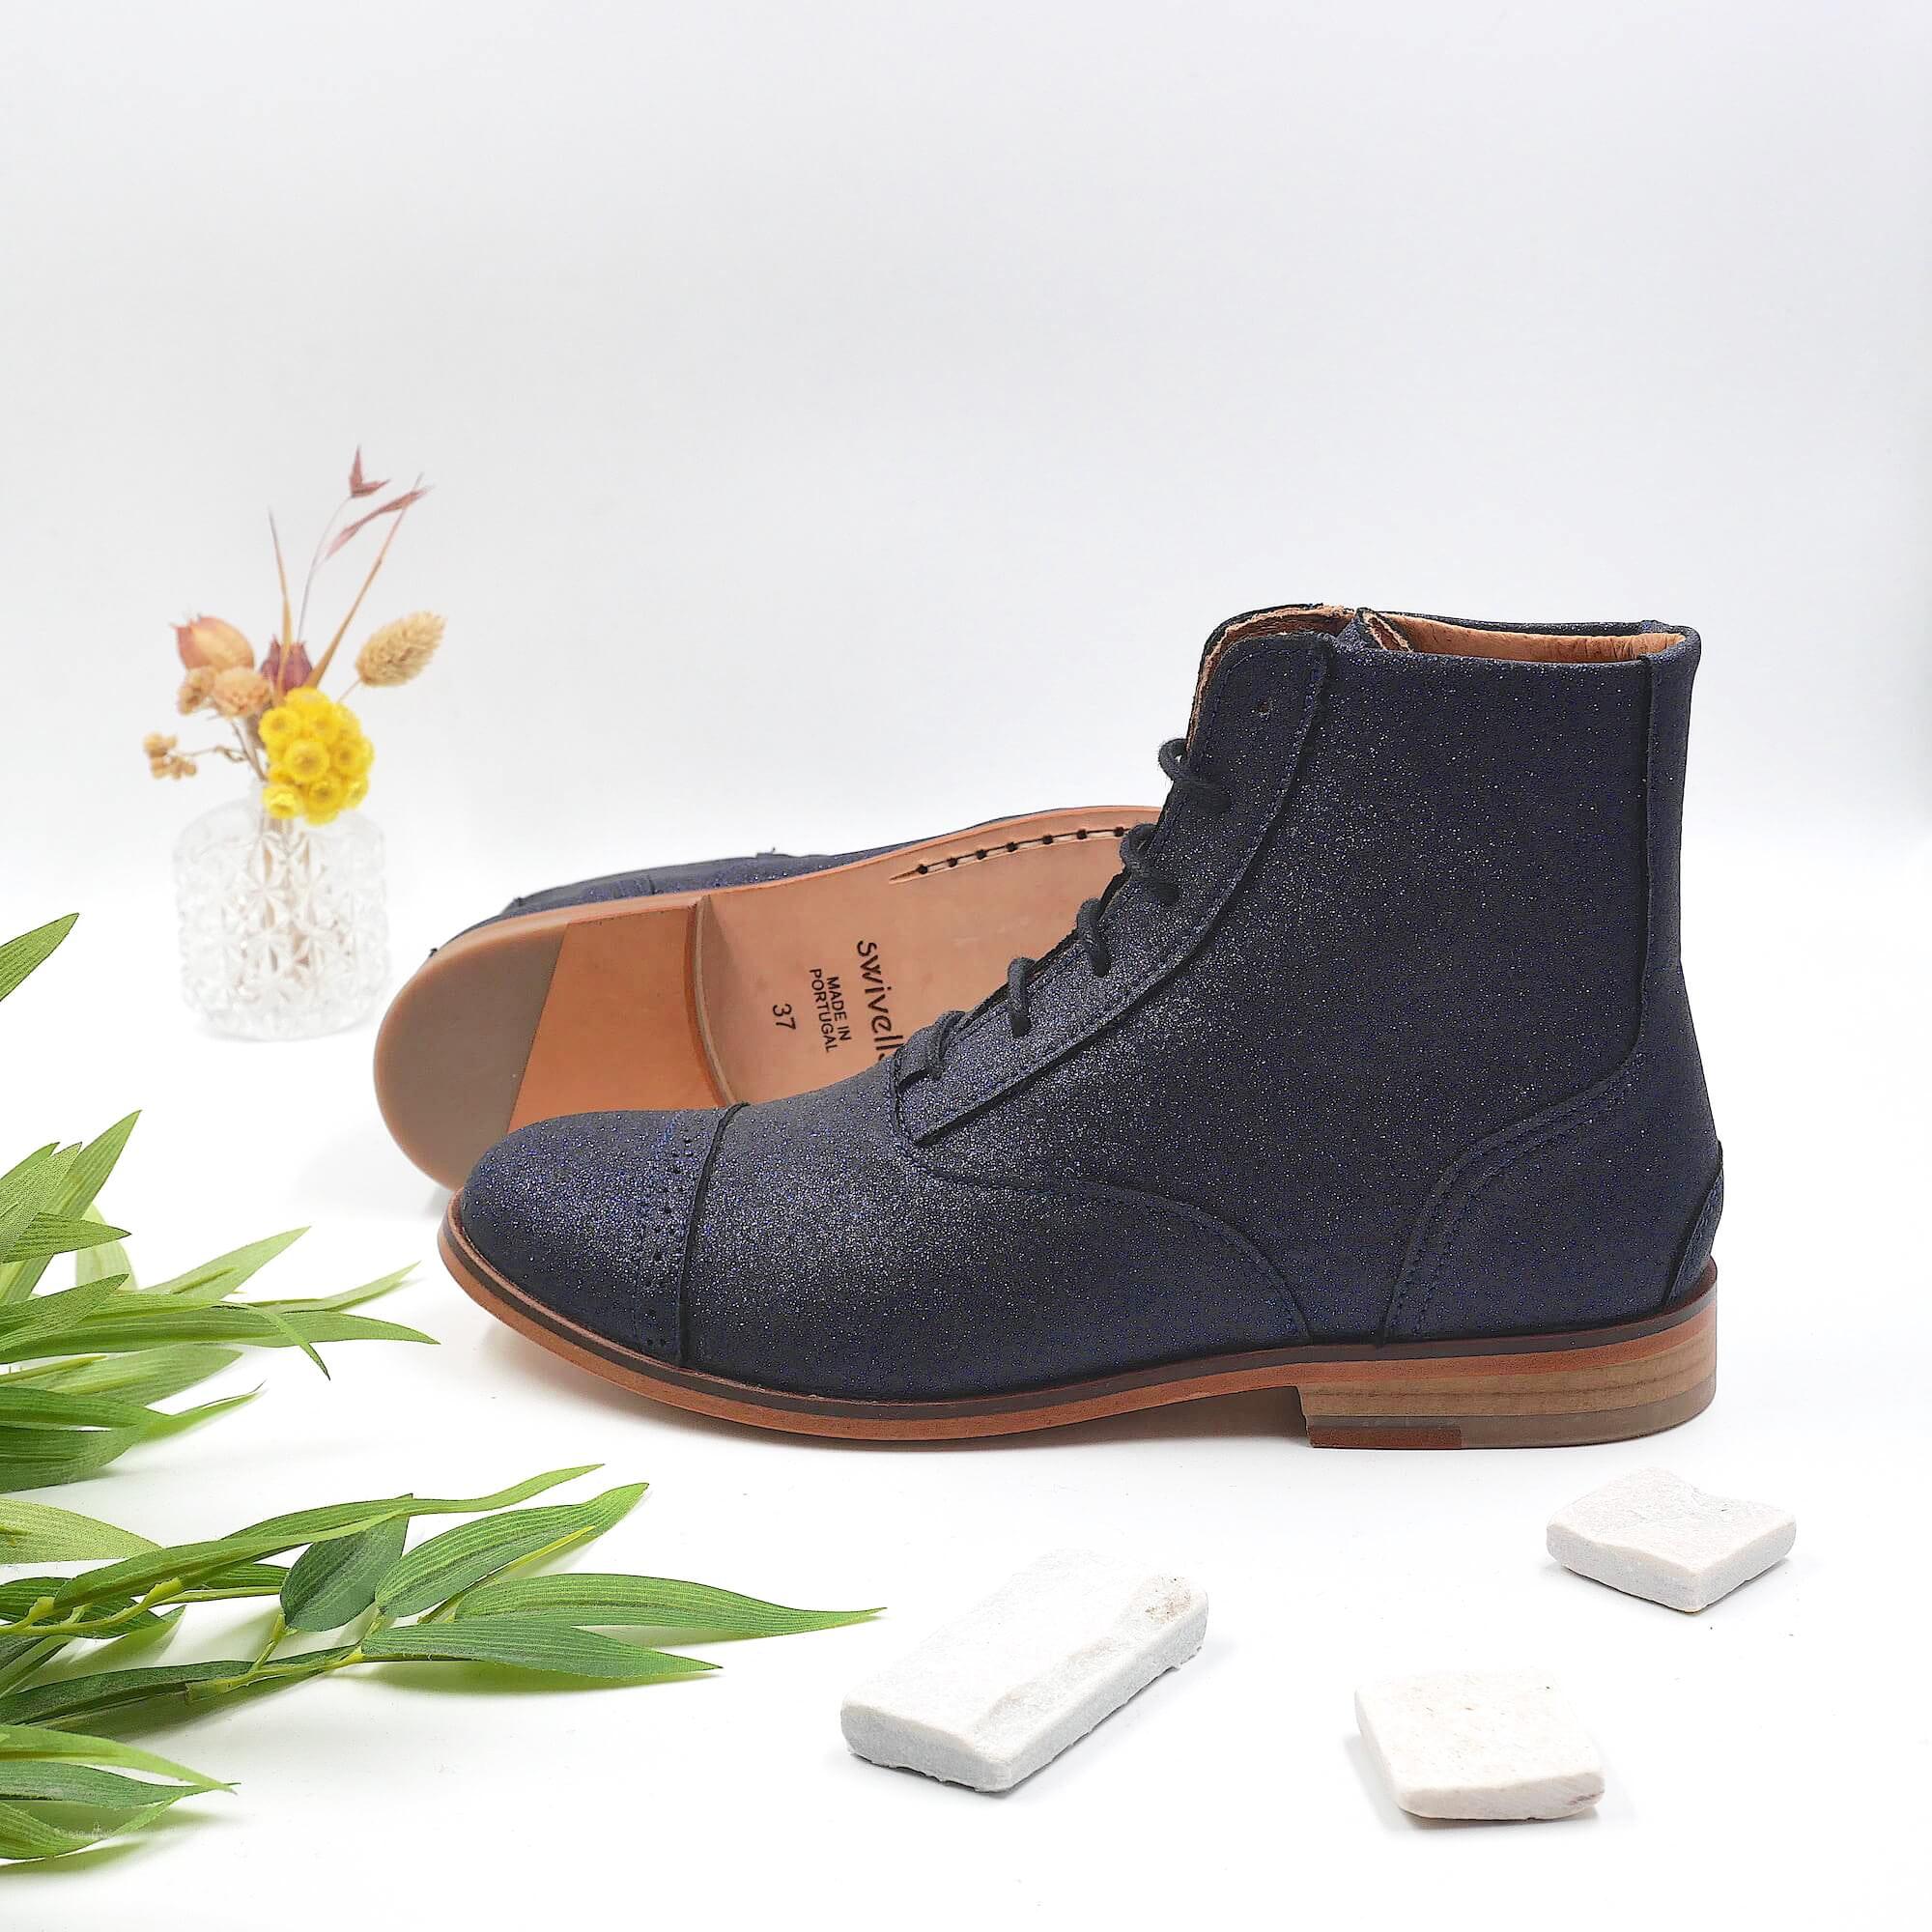 Mama Starry Dark blue glitter boots picture